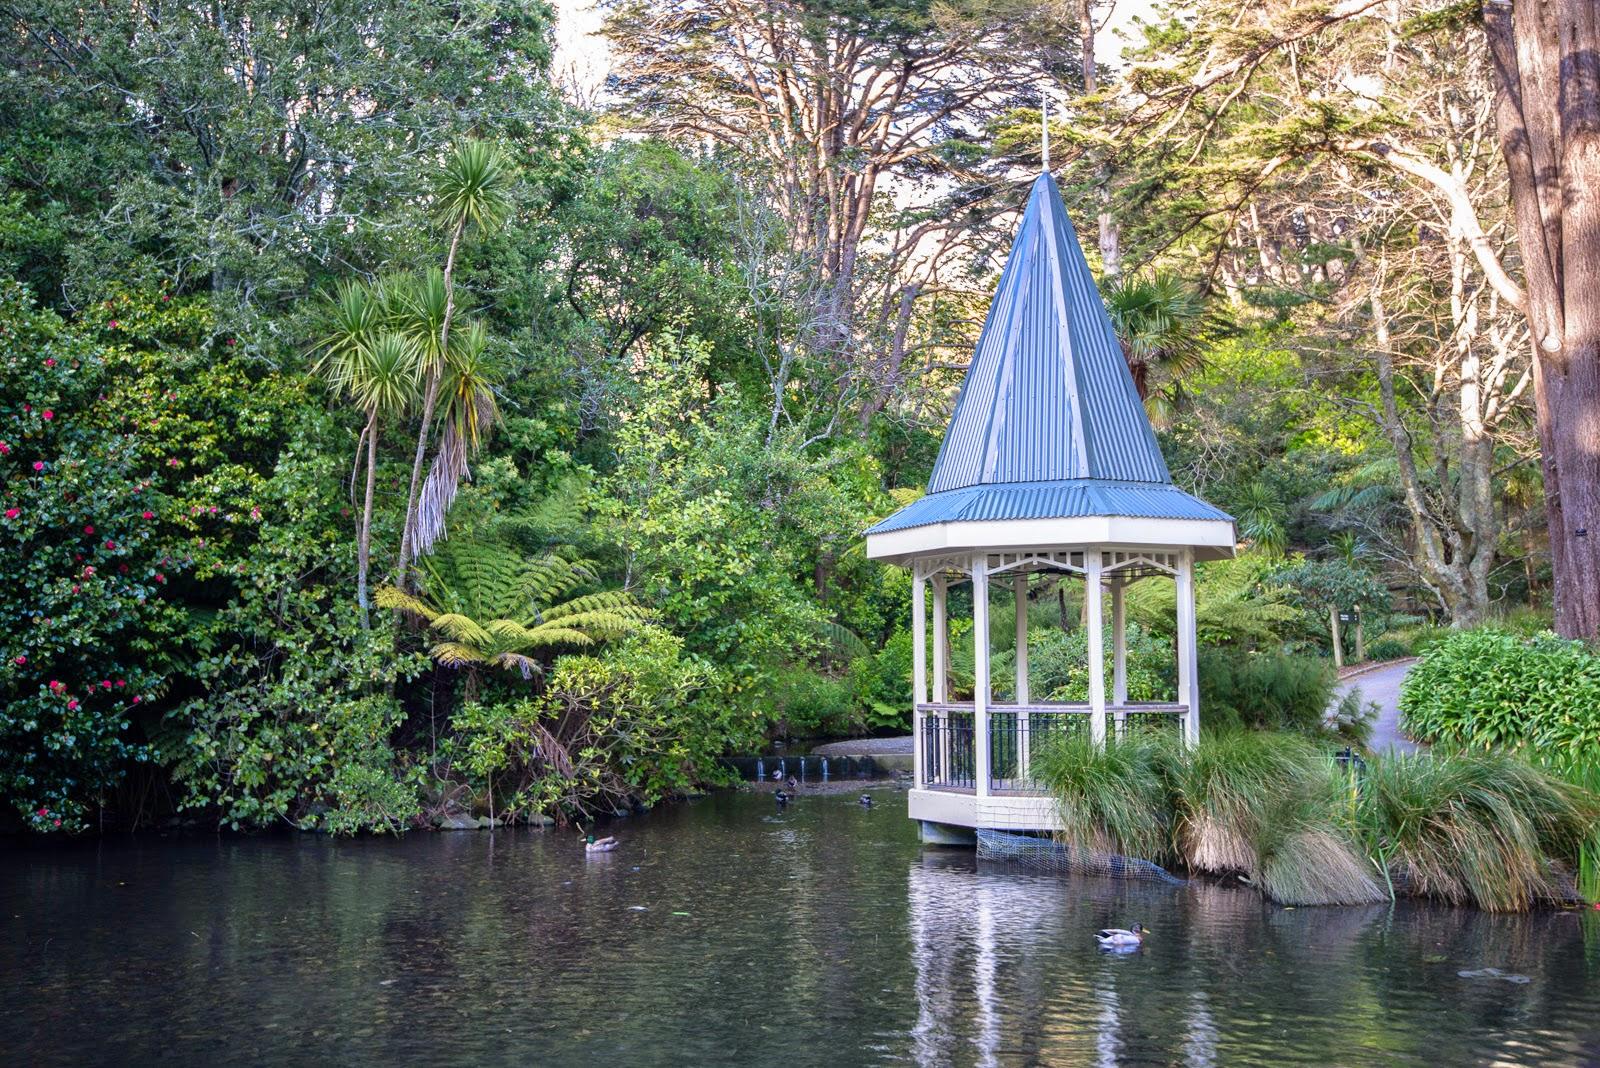 pergola ducks duckpond Wellington gardens